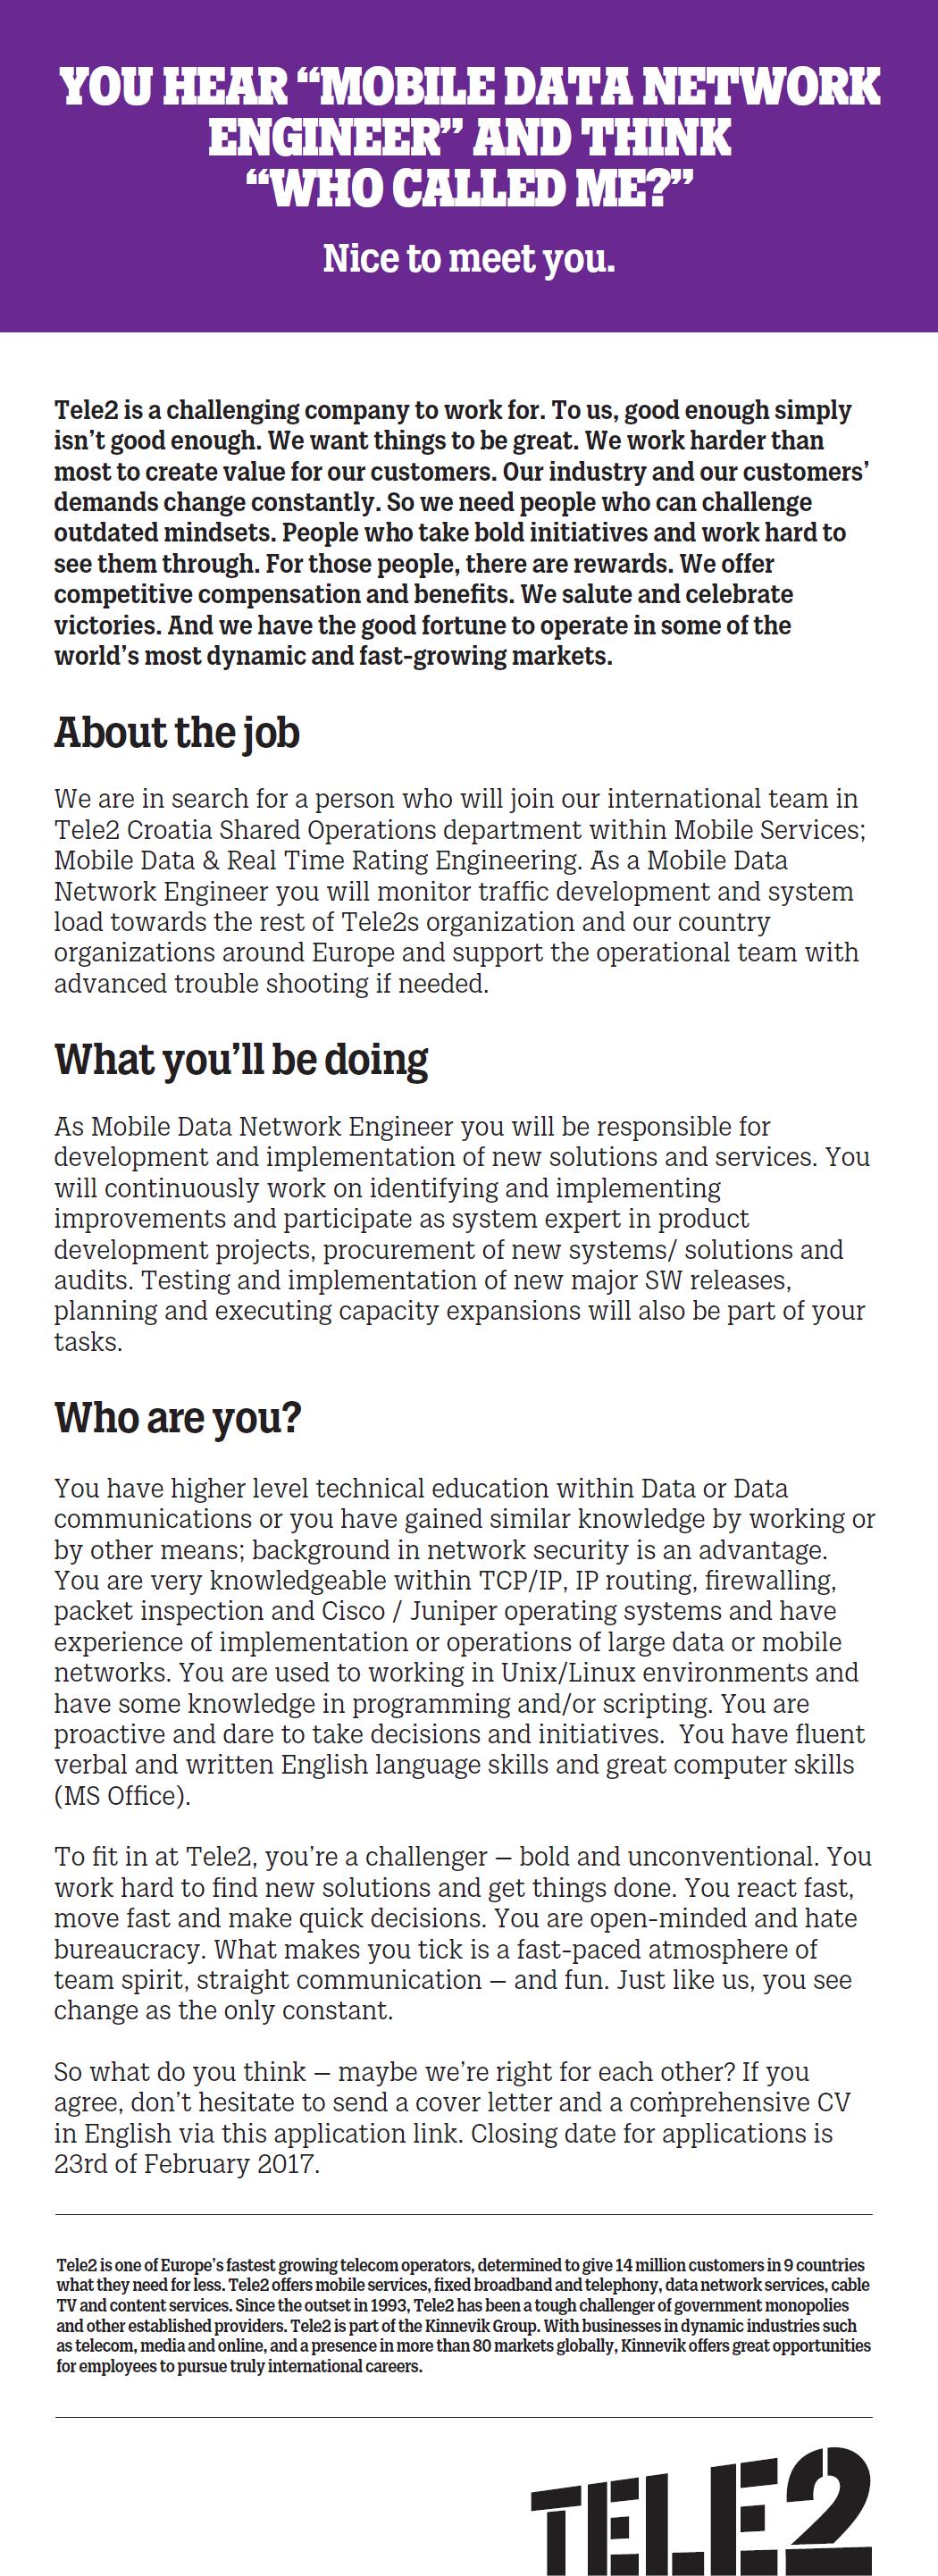 cover letter template for network job cover letter samples - Network Implementation Engineer Sample Resume